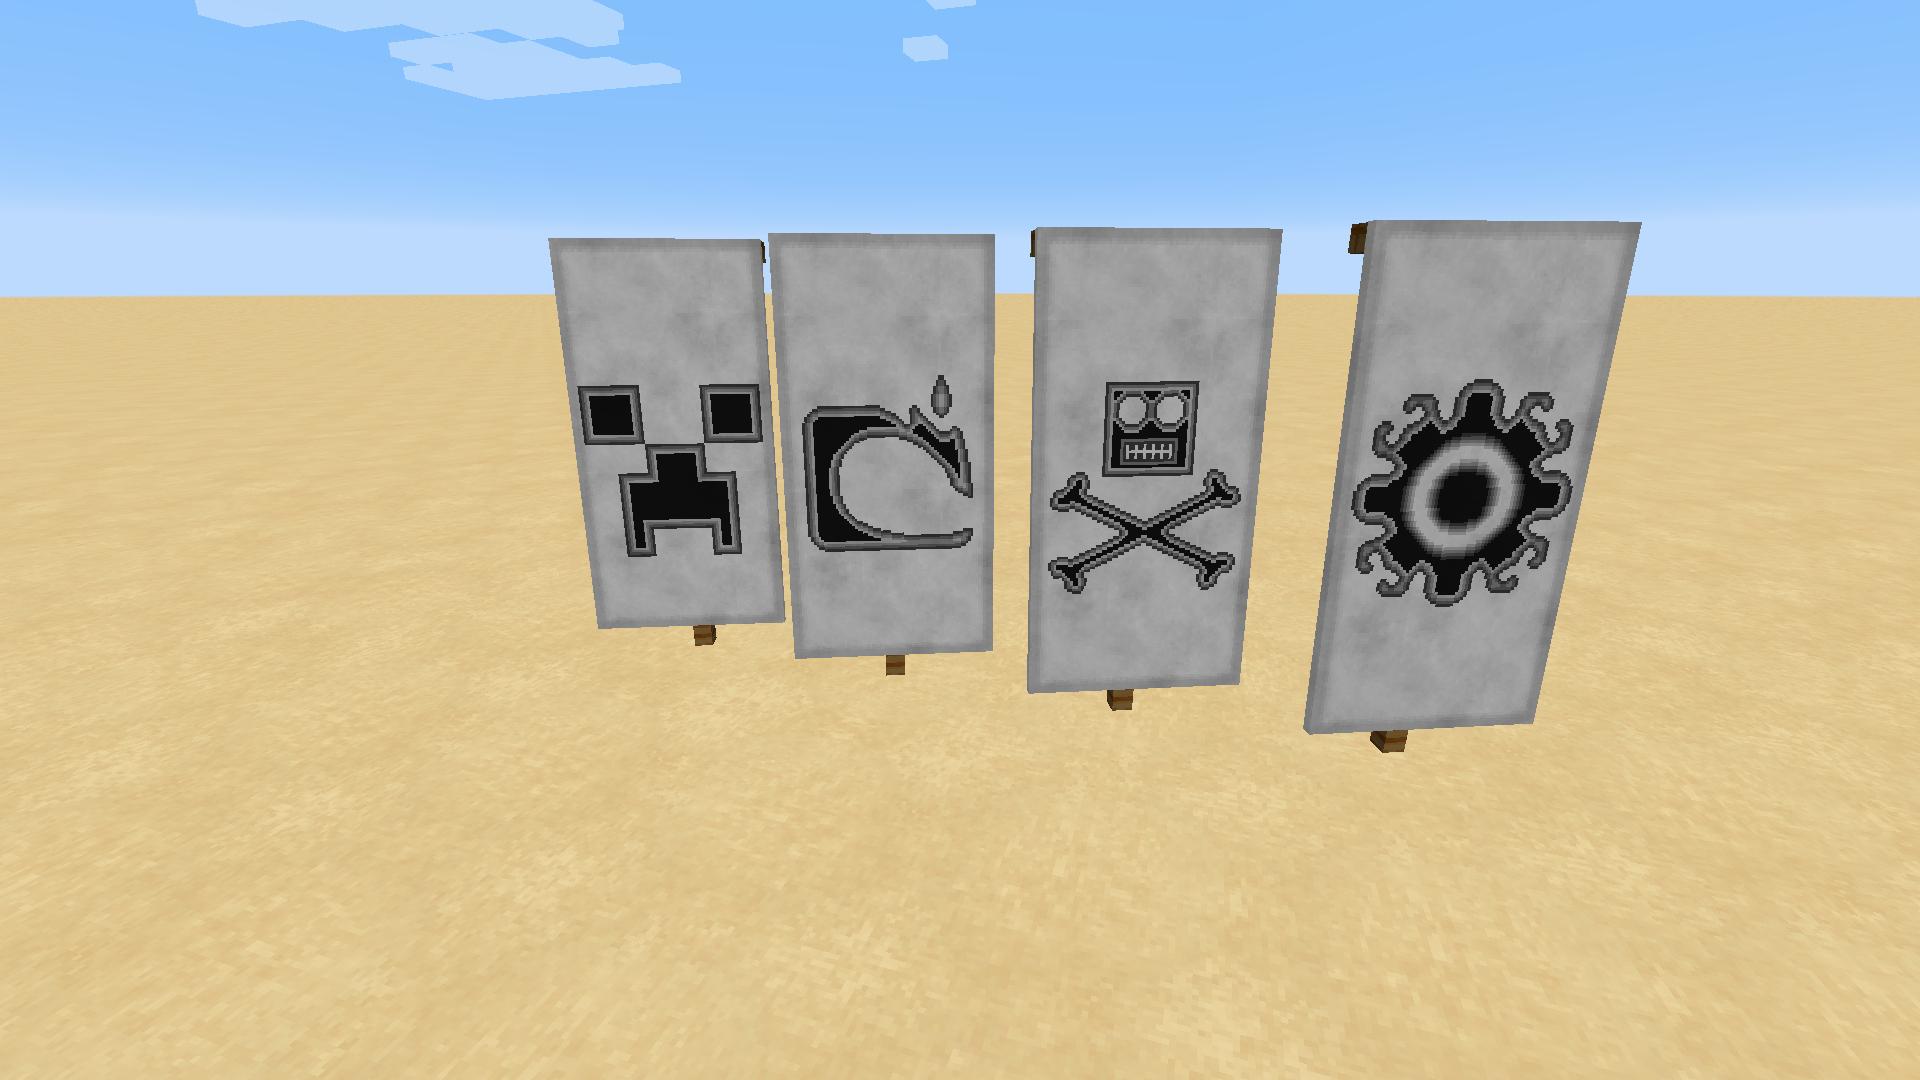 Heart Minecraft Banner Elegant Green Lightning 1 4 the Double Update A Bright